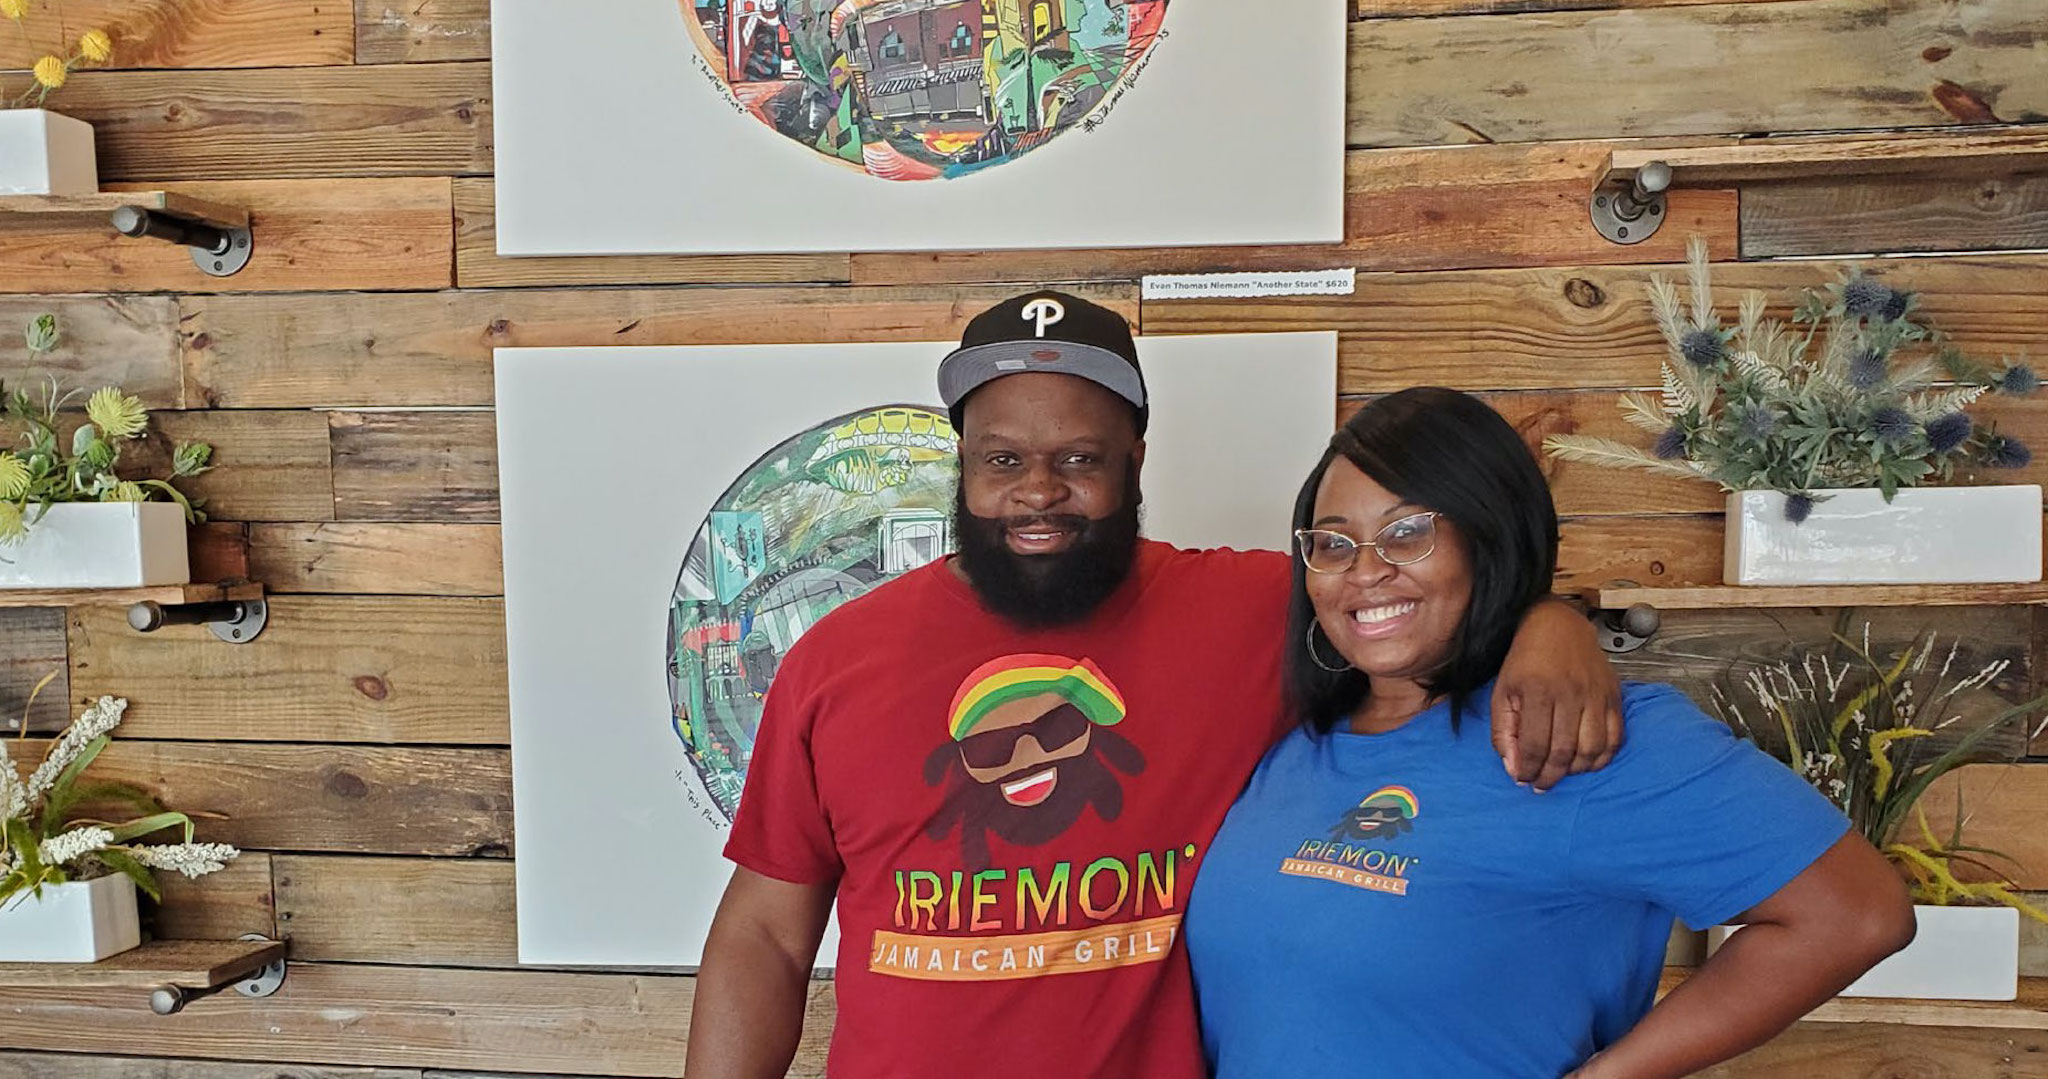 Chef Dean Hudson and Melissa Grannum of Irie Mon Jamaican Grill